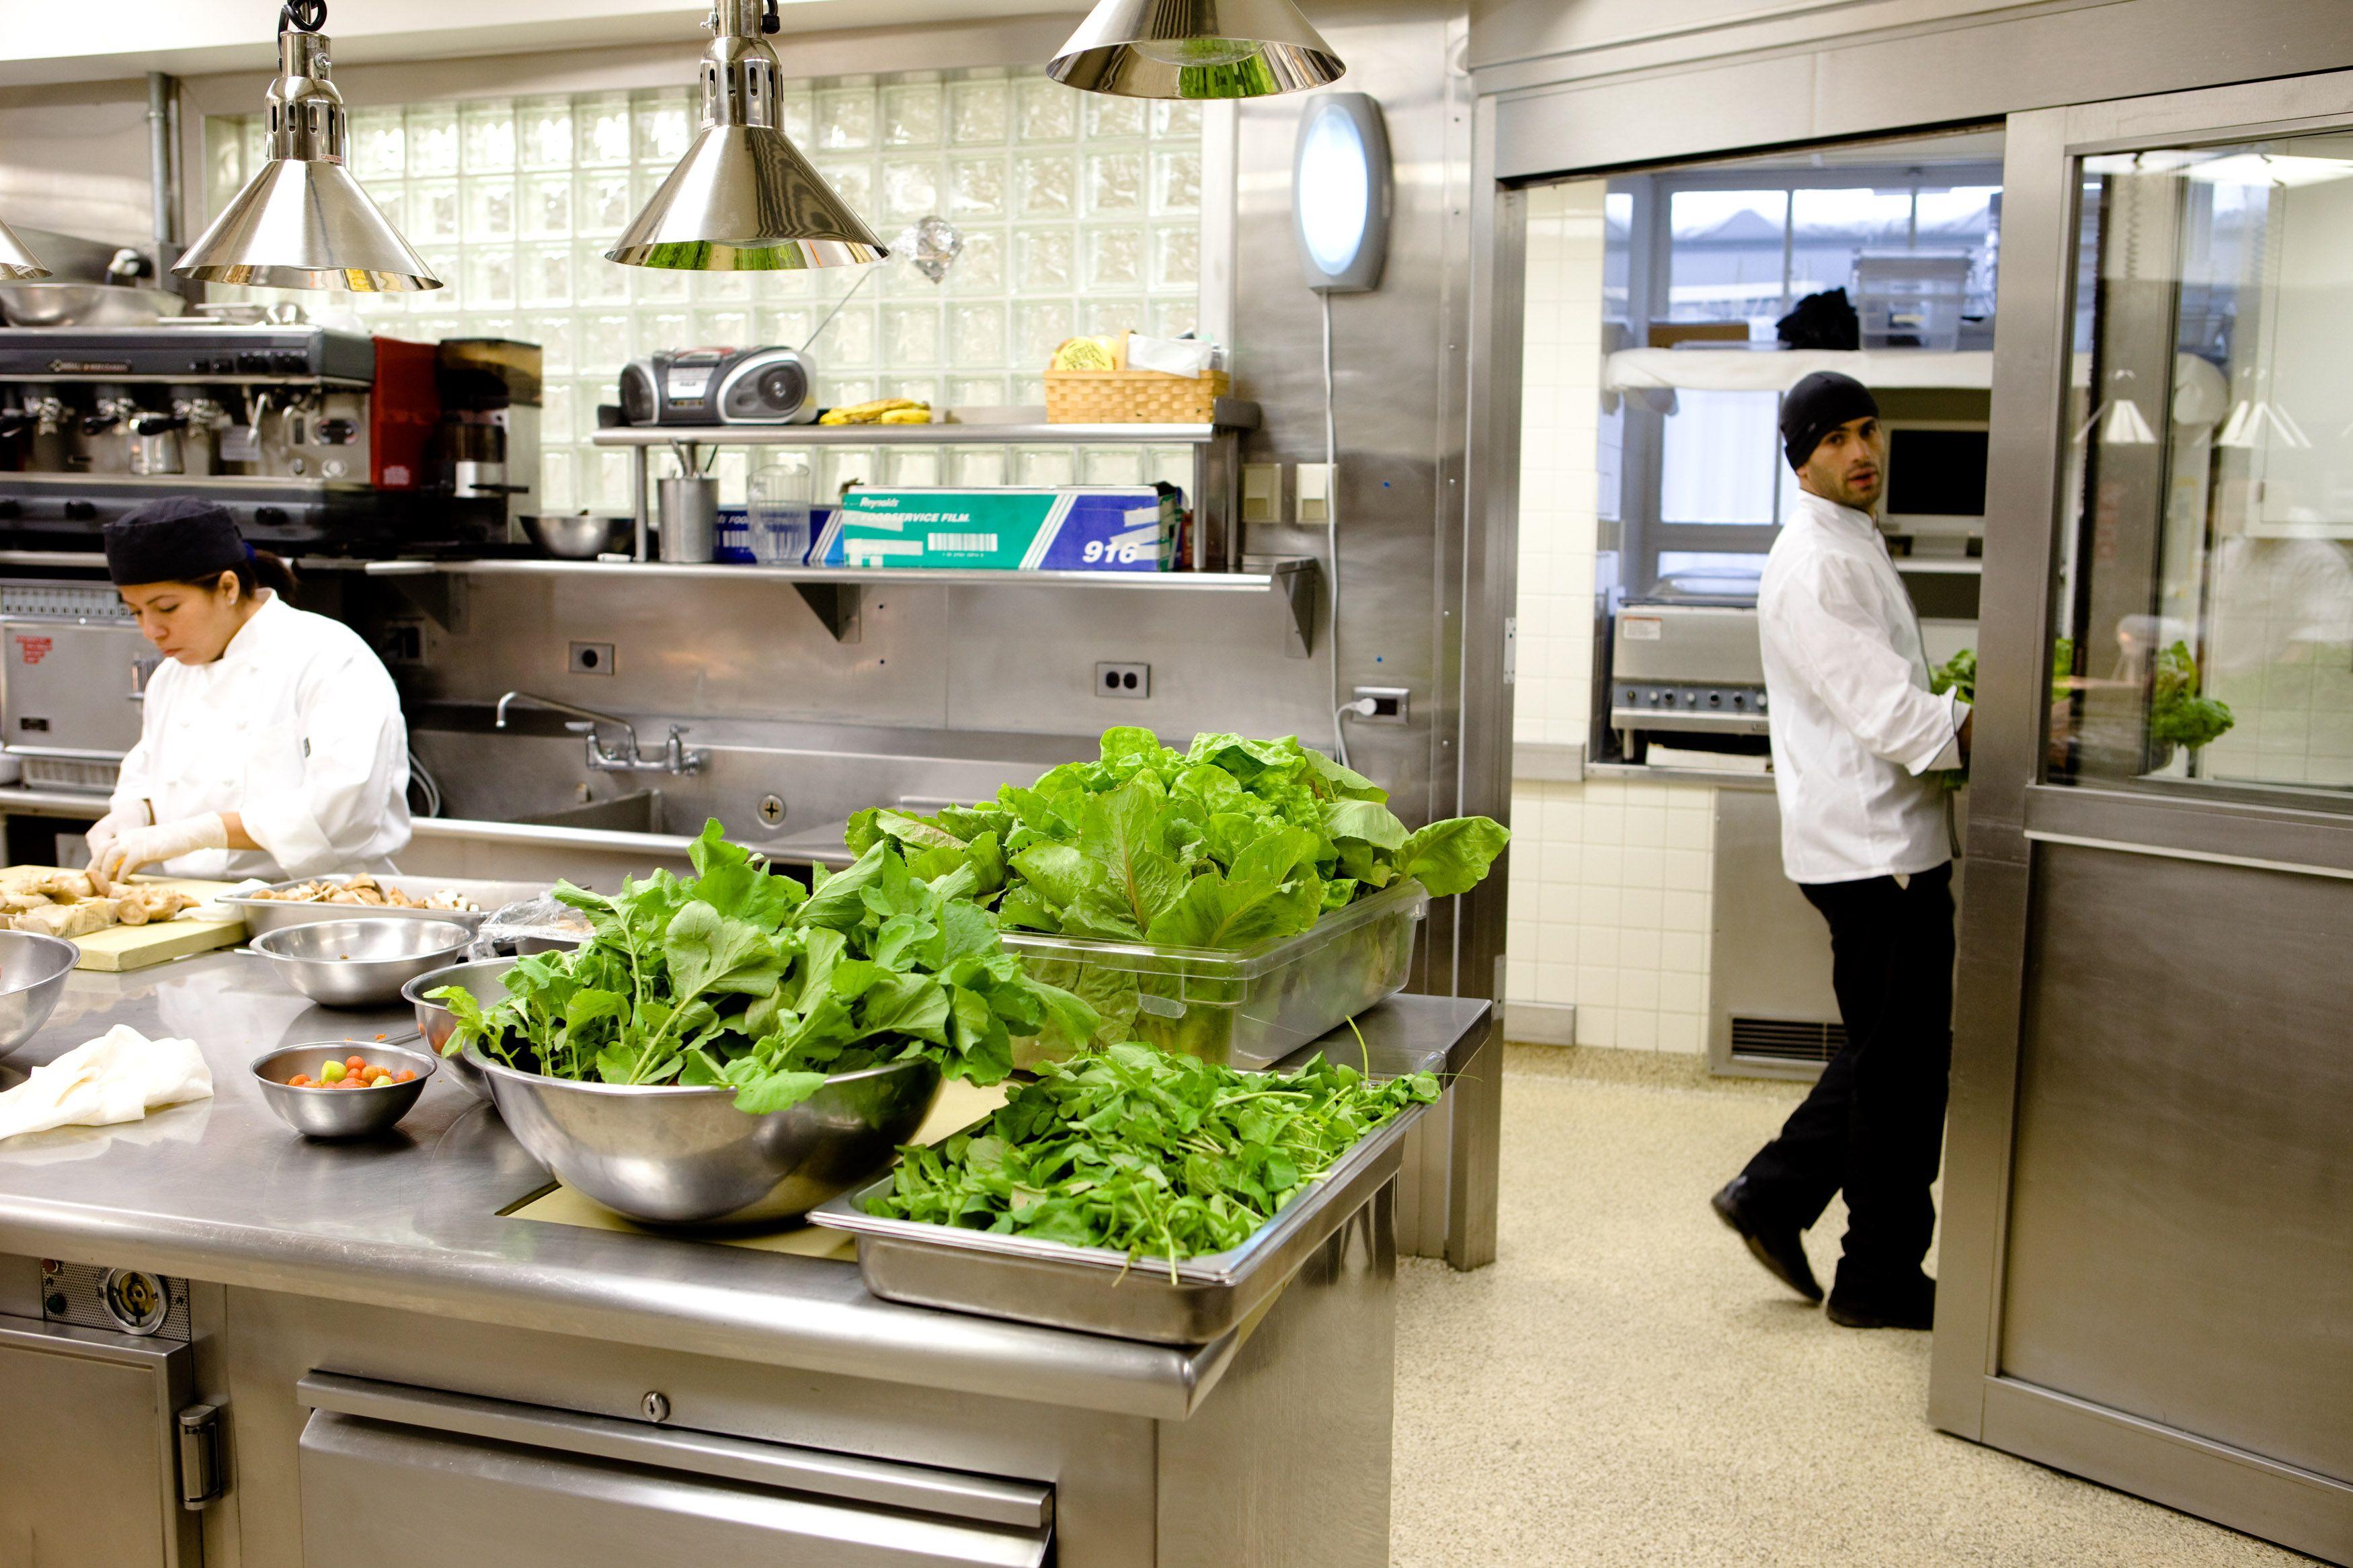 White House Kitchen Garden On Video Cuisines Maison Cuisine Restaurant Cuisine Intelligente The kitchen in the white house